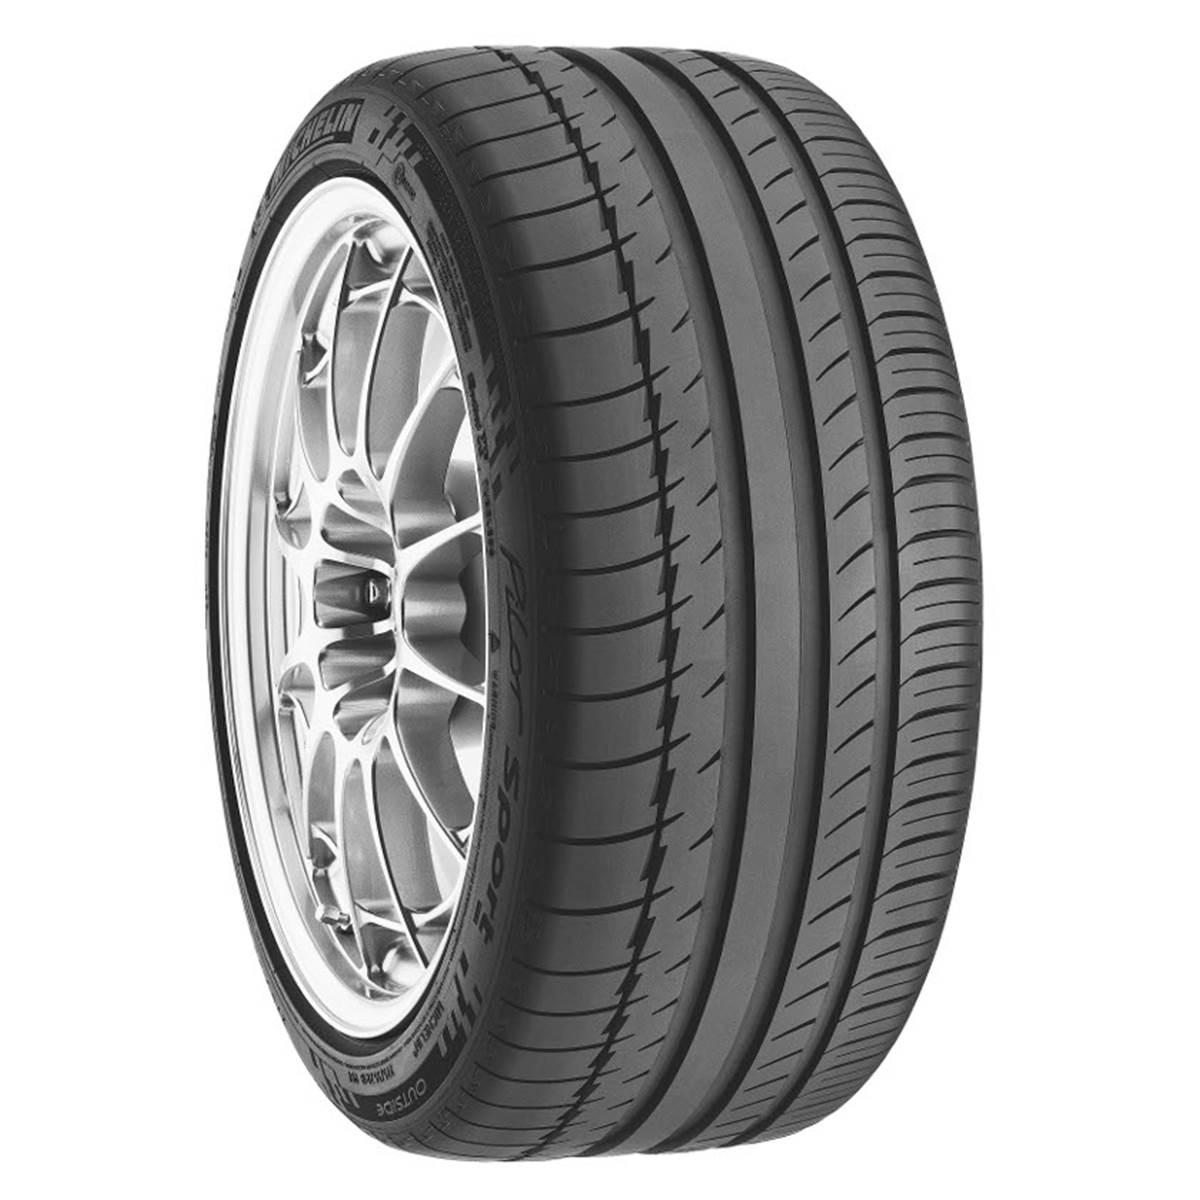 Pneu Michelin 285/35R19 99Y Pilot Sport Ps2